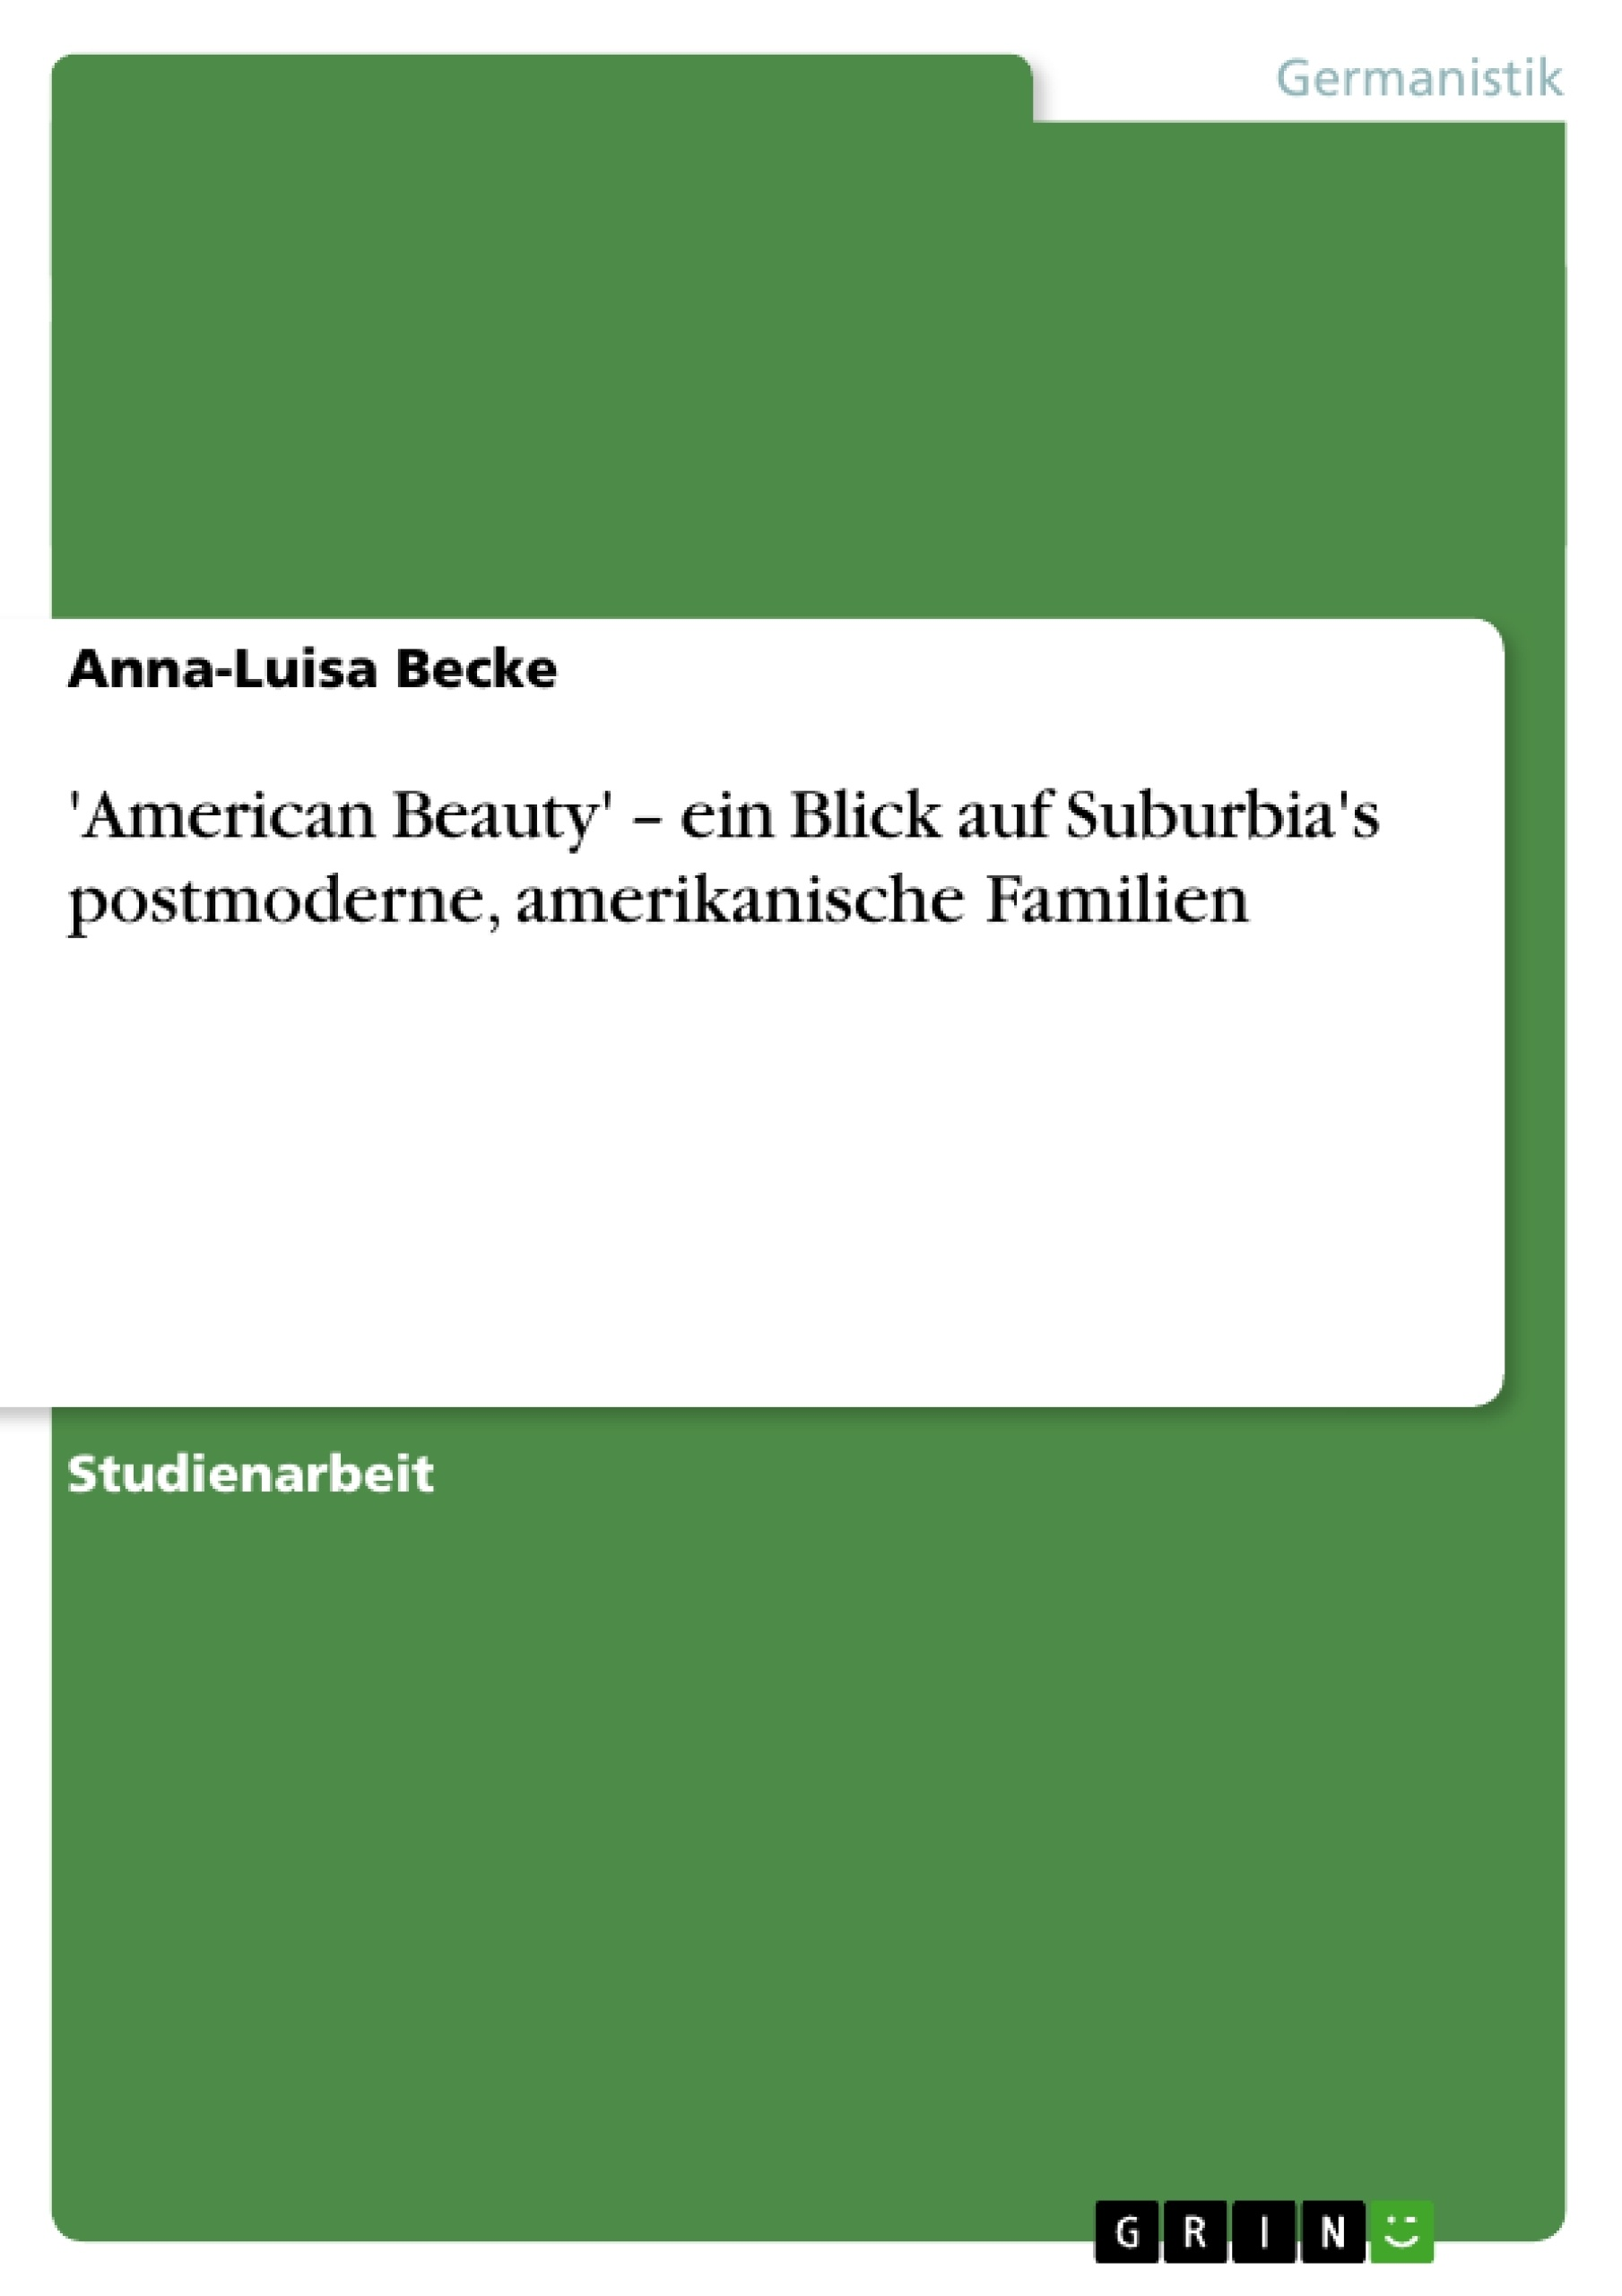 Titel: 'American Beauty' – ein Blick auf Suburbia's postmoderne, amerikanische Familien